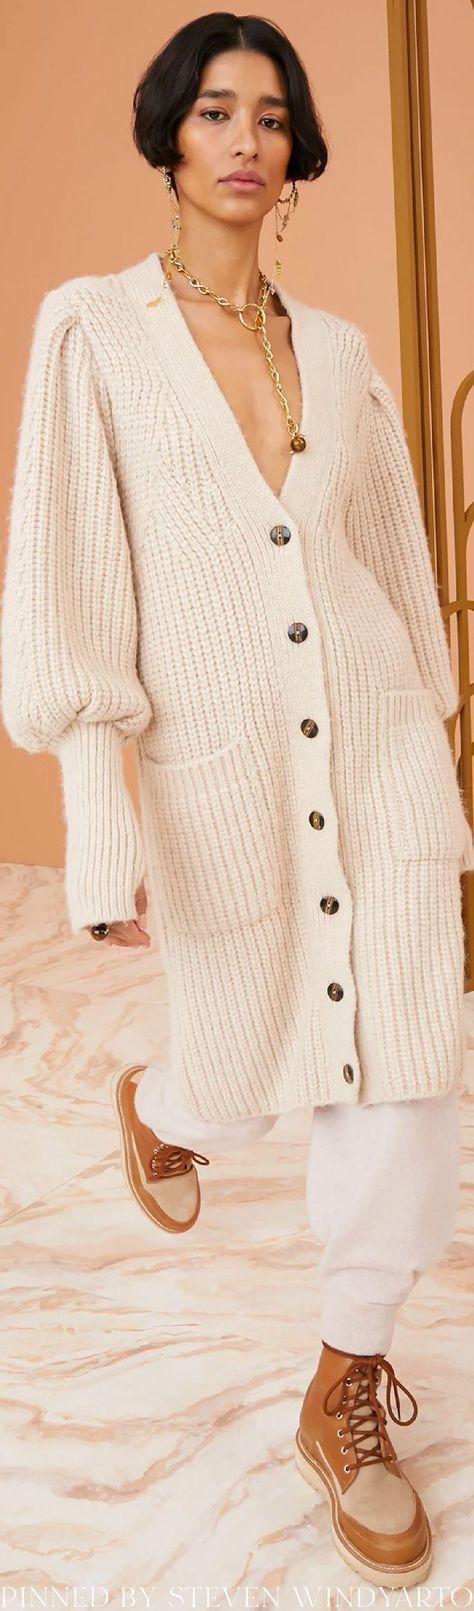 Ulla Johnson Fall 2021 Lookbook - Aiden Cardigan #fall2021 #fw21 #womenswear #ullajohnson